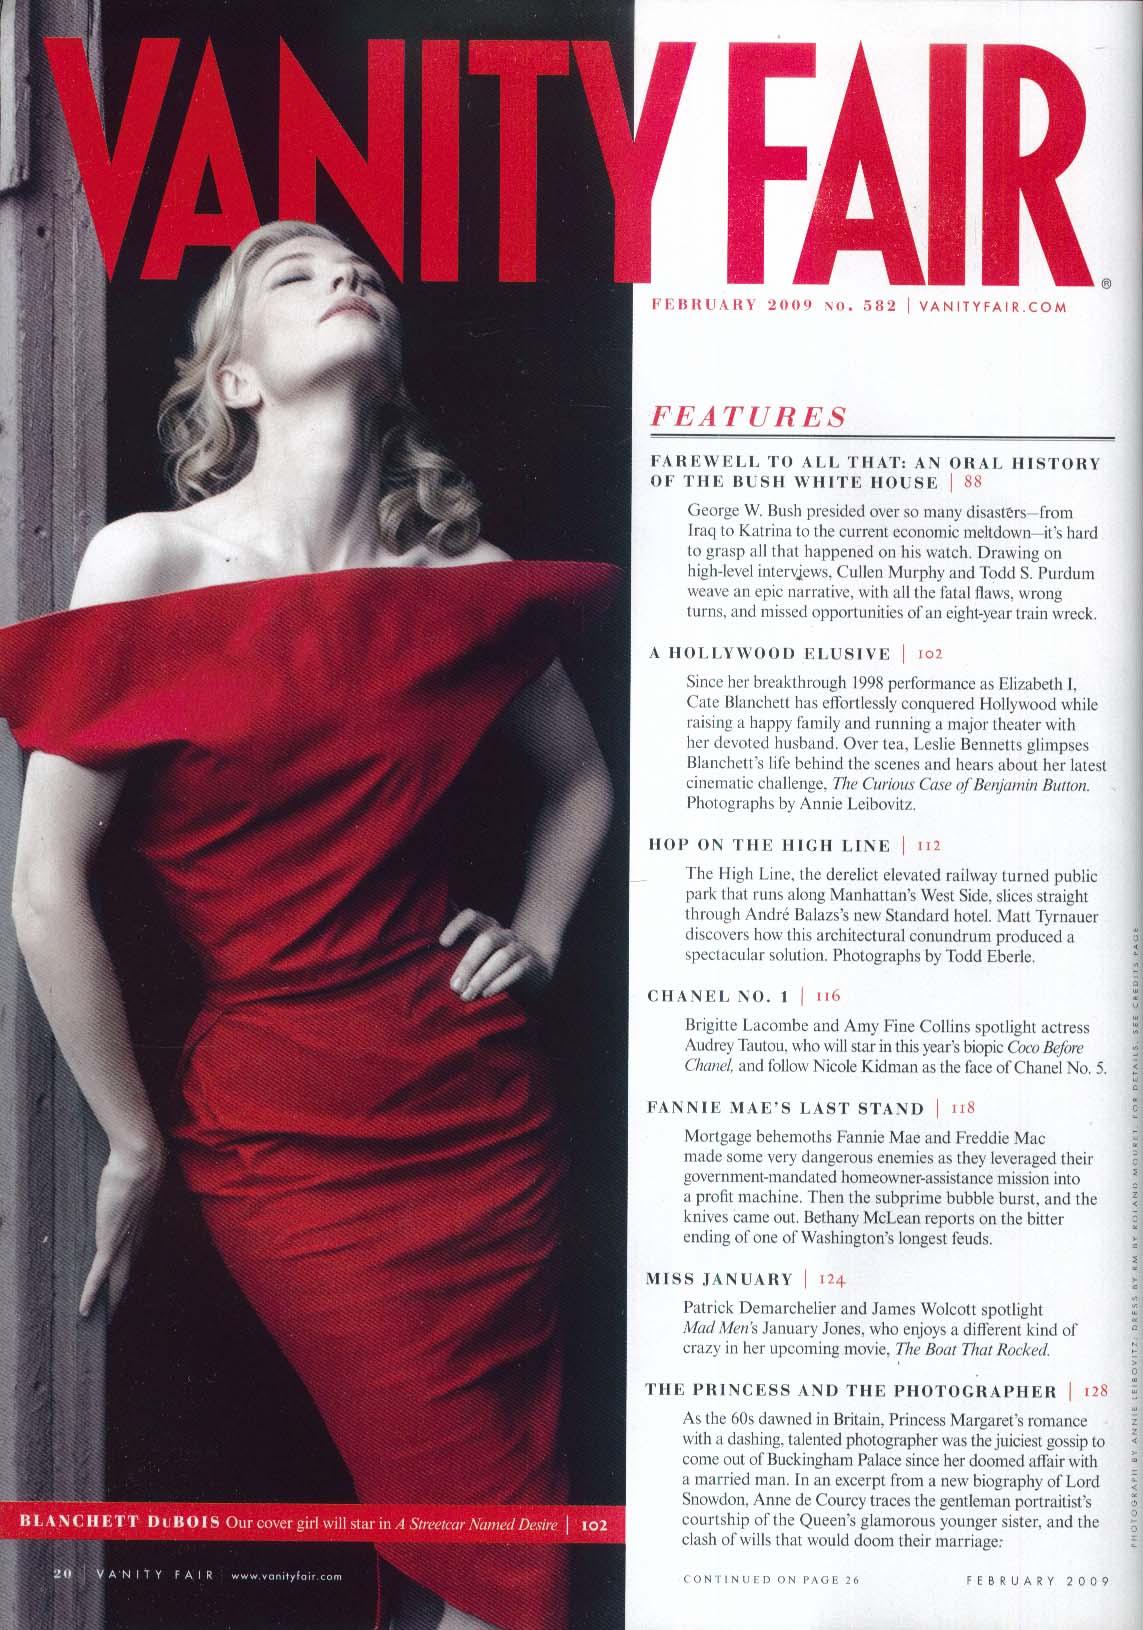 VANITY FAIR Cate Blanchett Leibovitz January Jones Christopher Hitchens + 2 2009